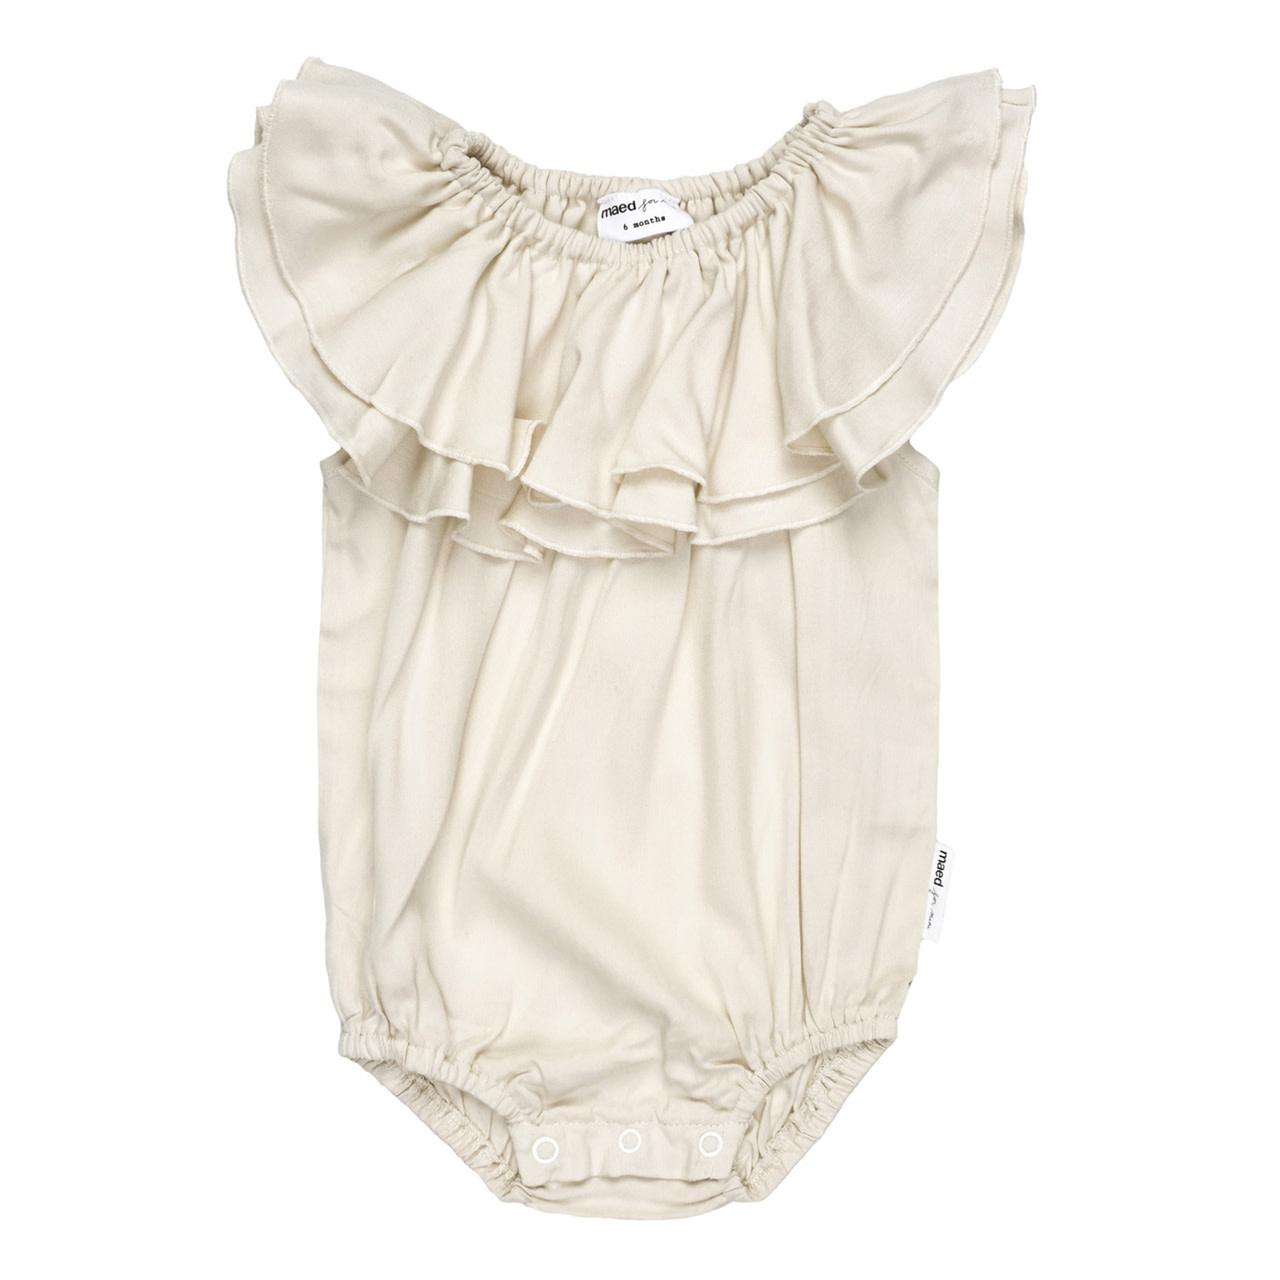 Maed For mini Mead For Mini - Preppy Pangolin Bodysuit